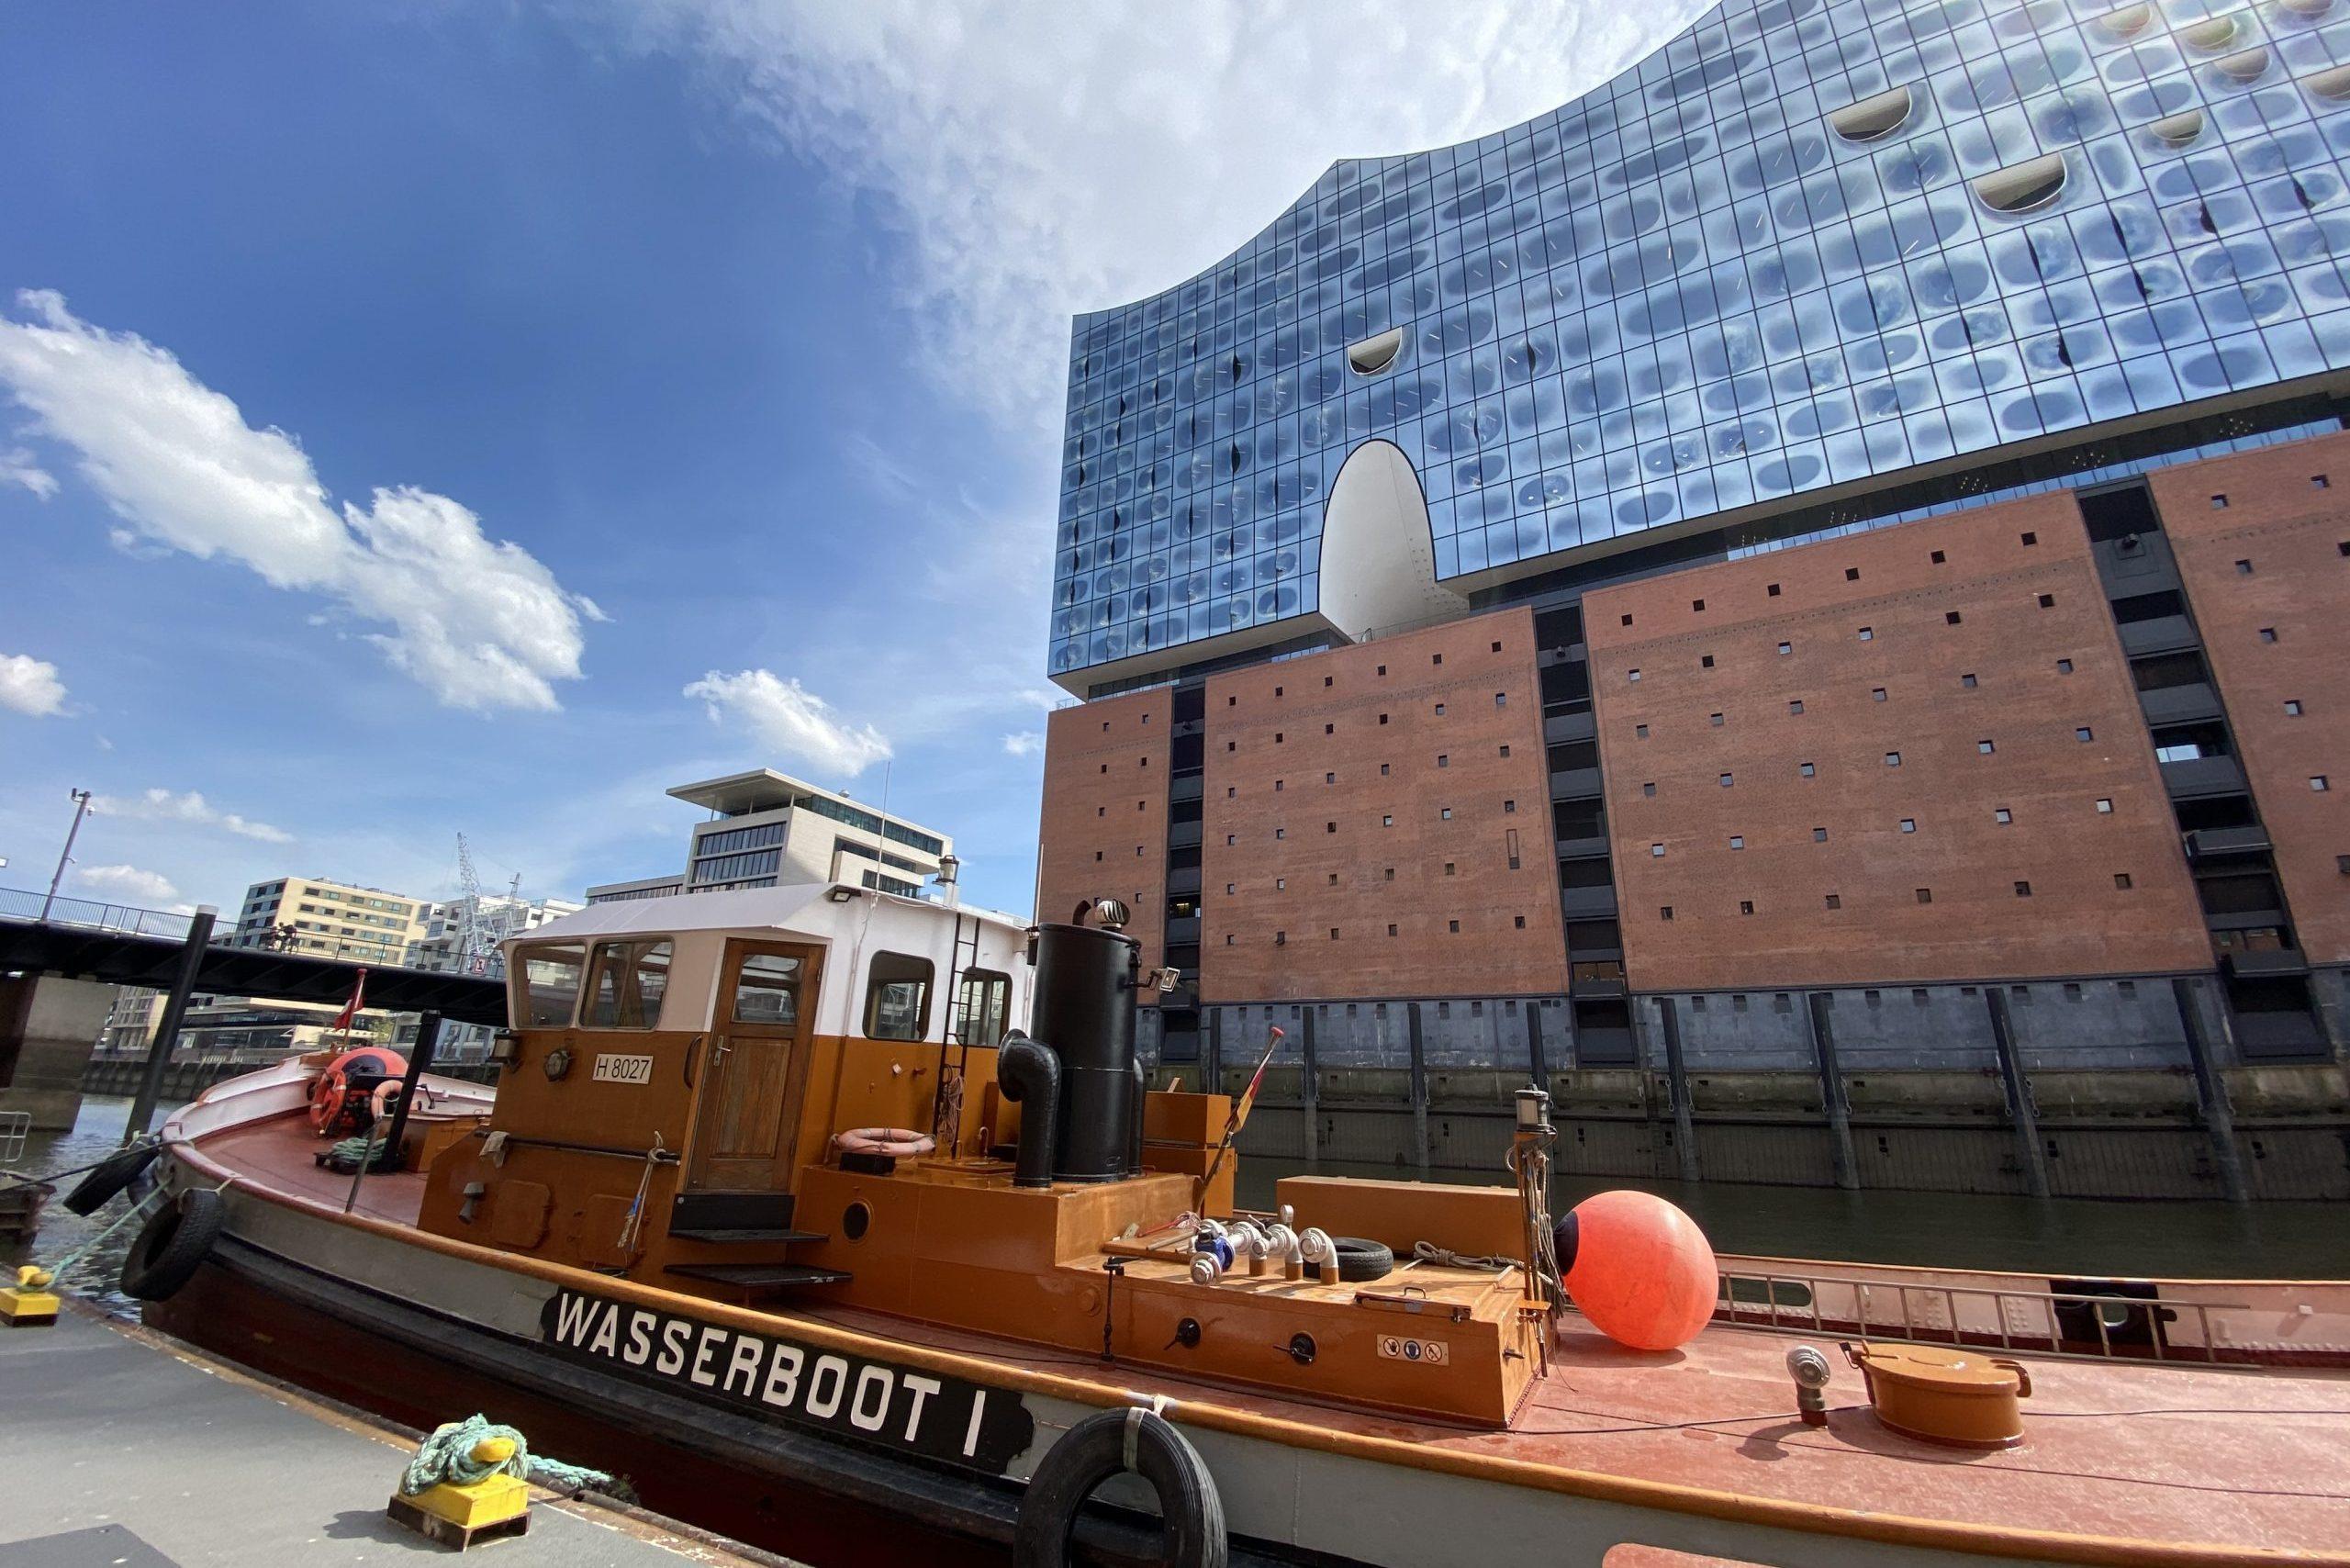 Wasserboot I